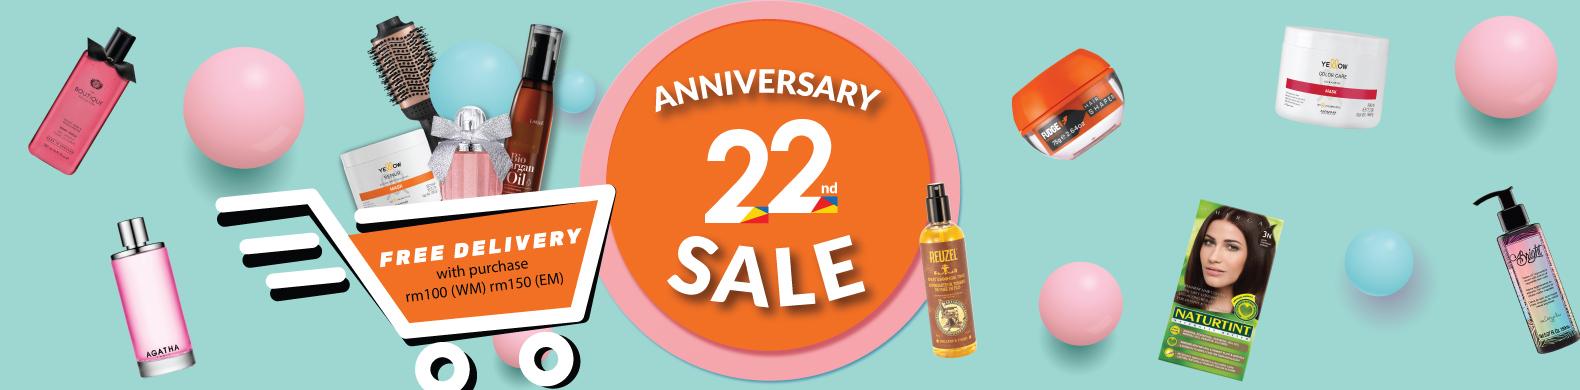 22nd Anniversary Sale